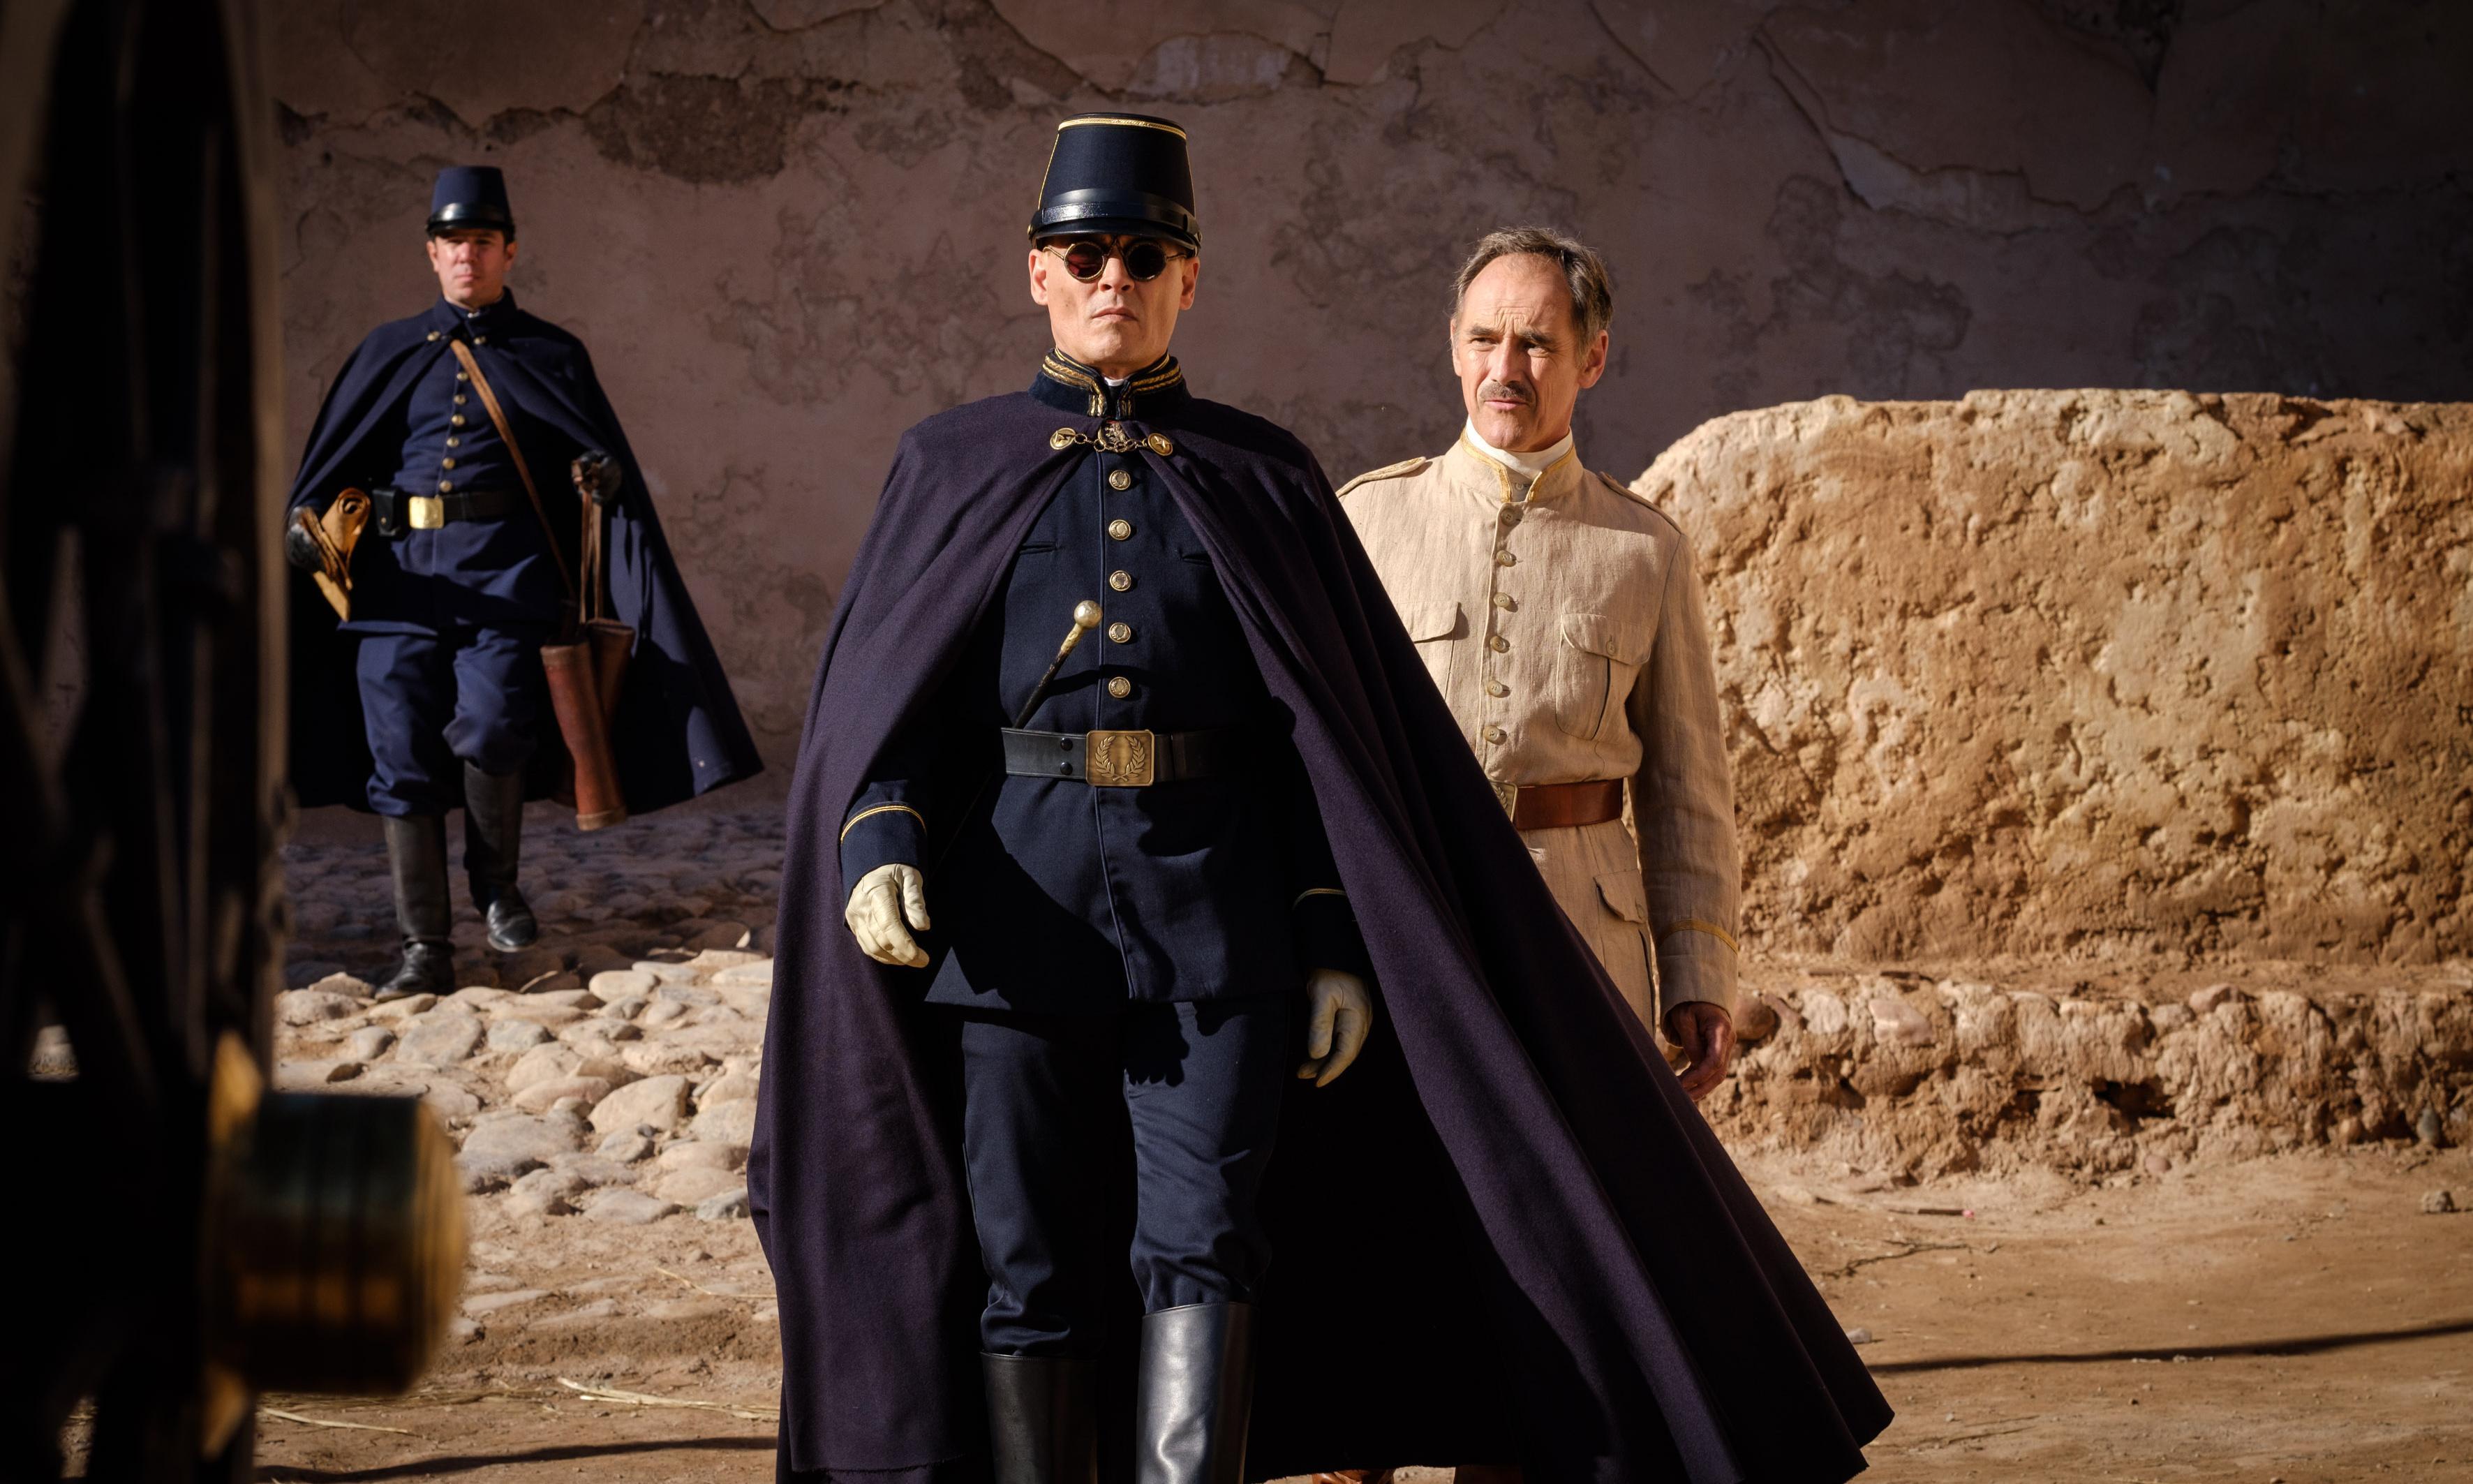 Rylance, Depp and Pattinson bring Coetzee to big screen